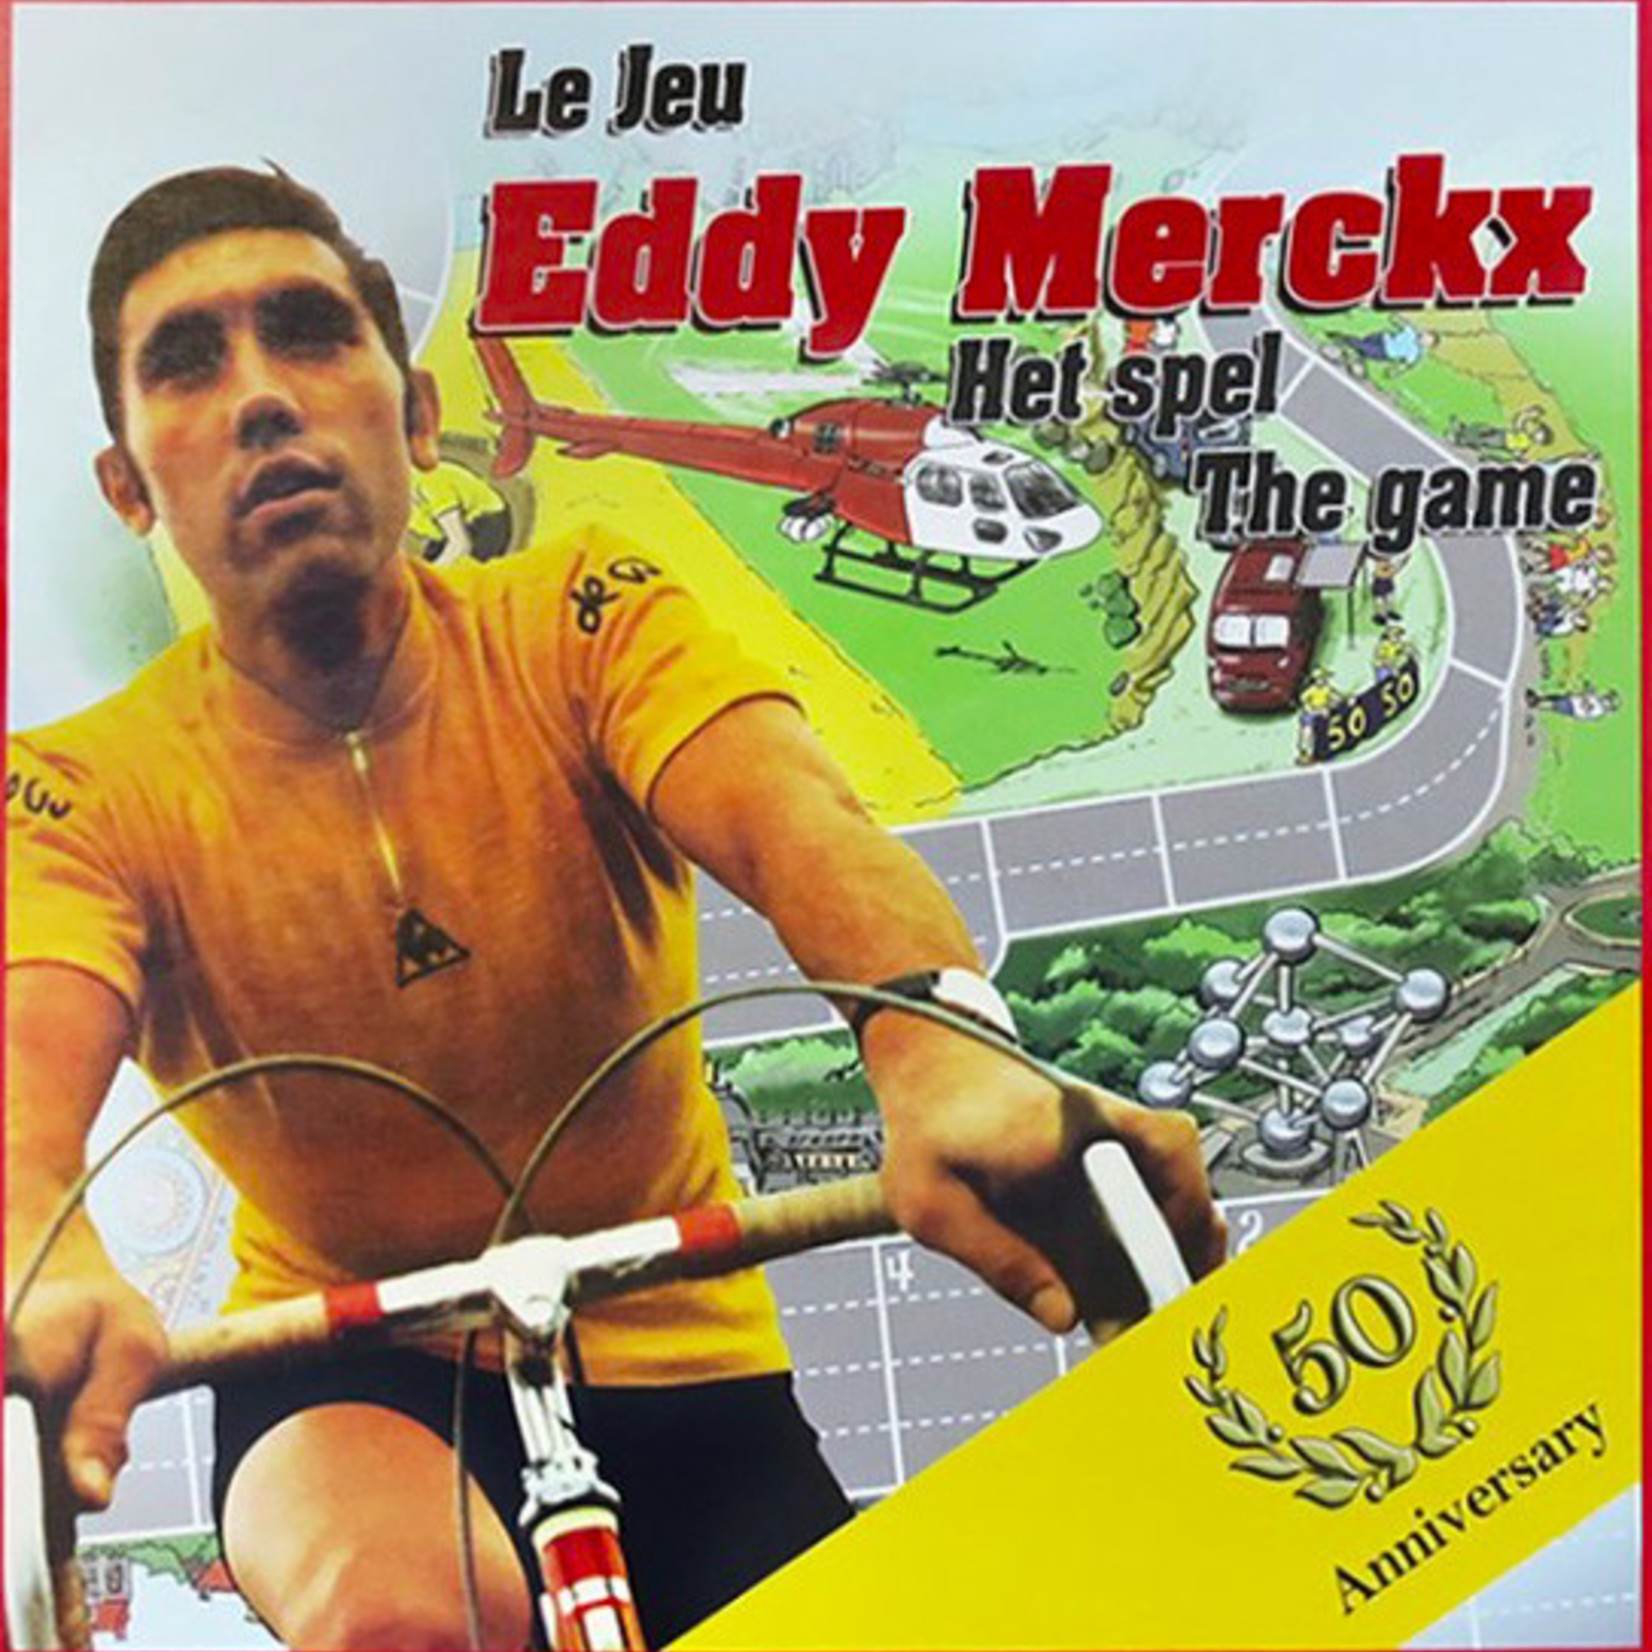 Eddy Merckx spel